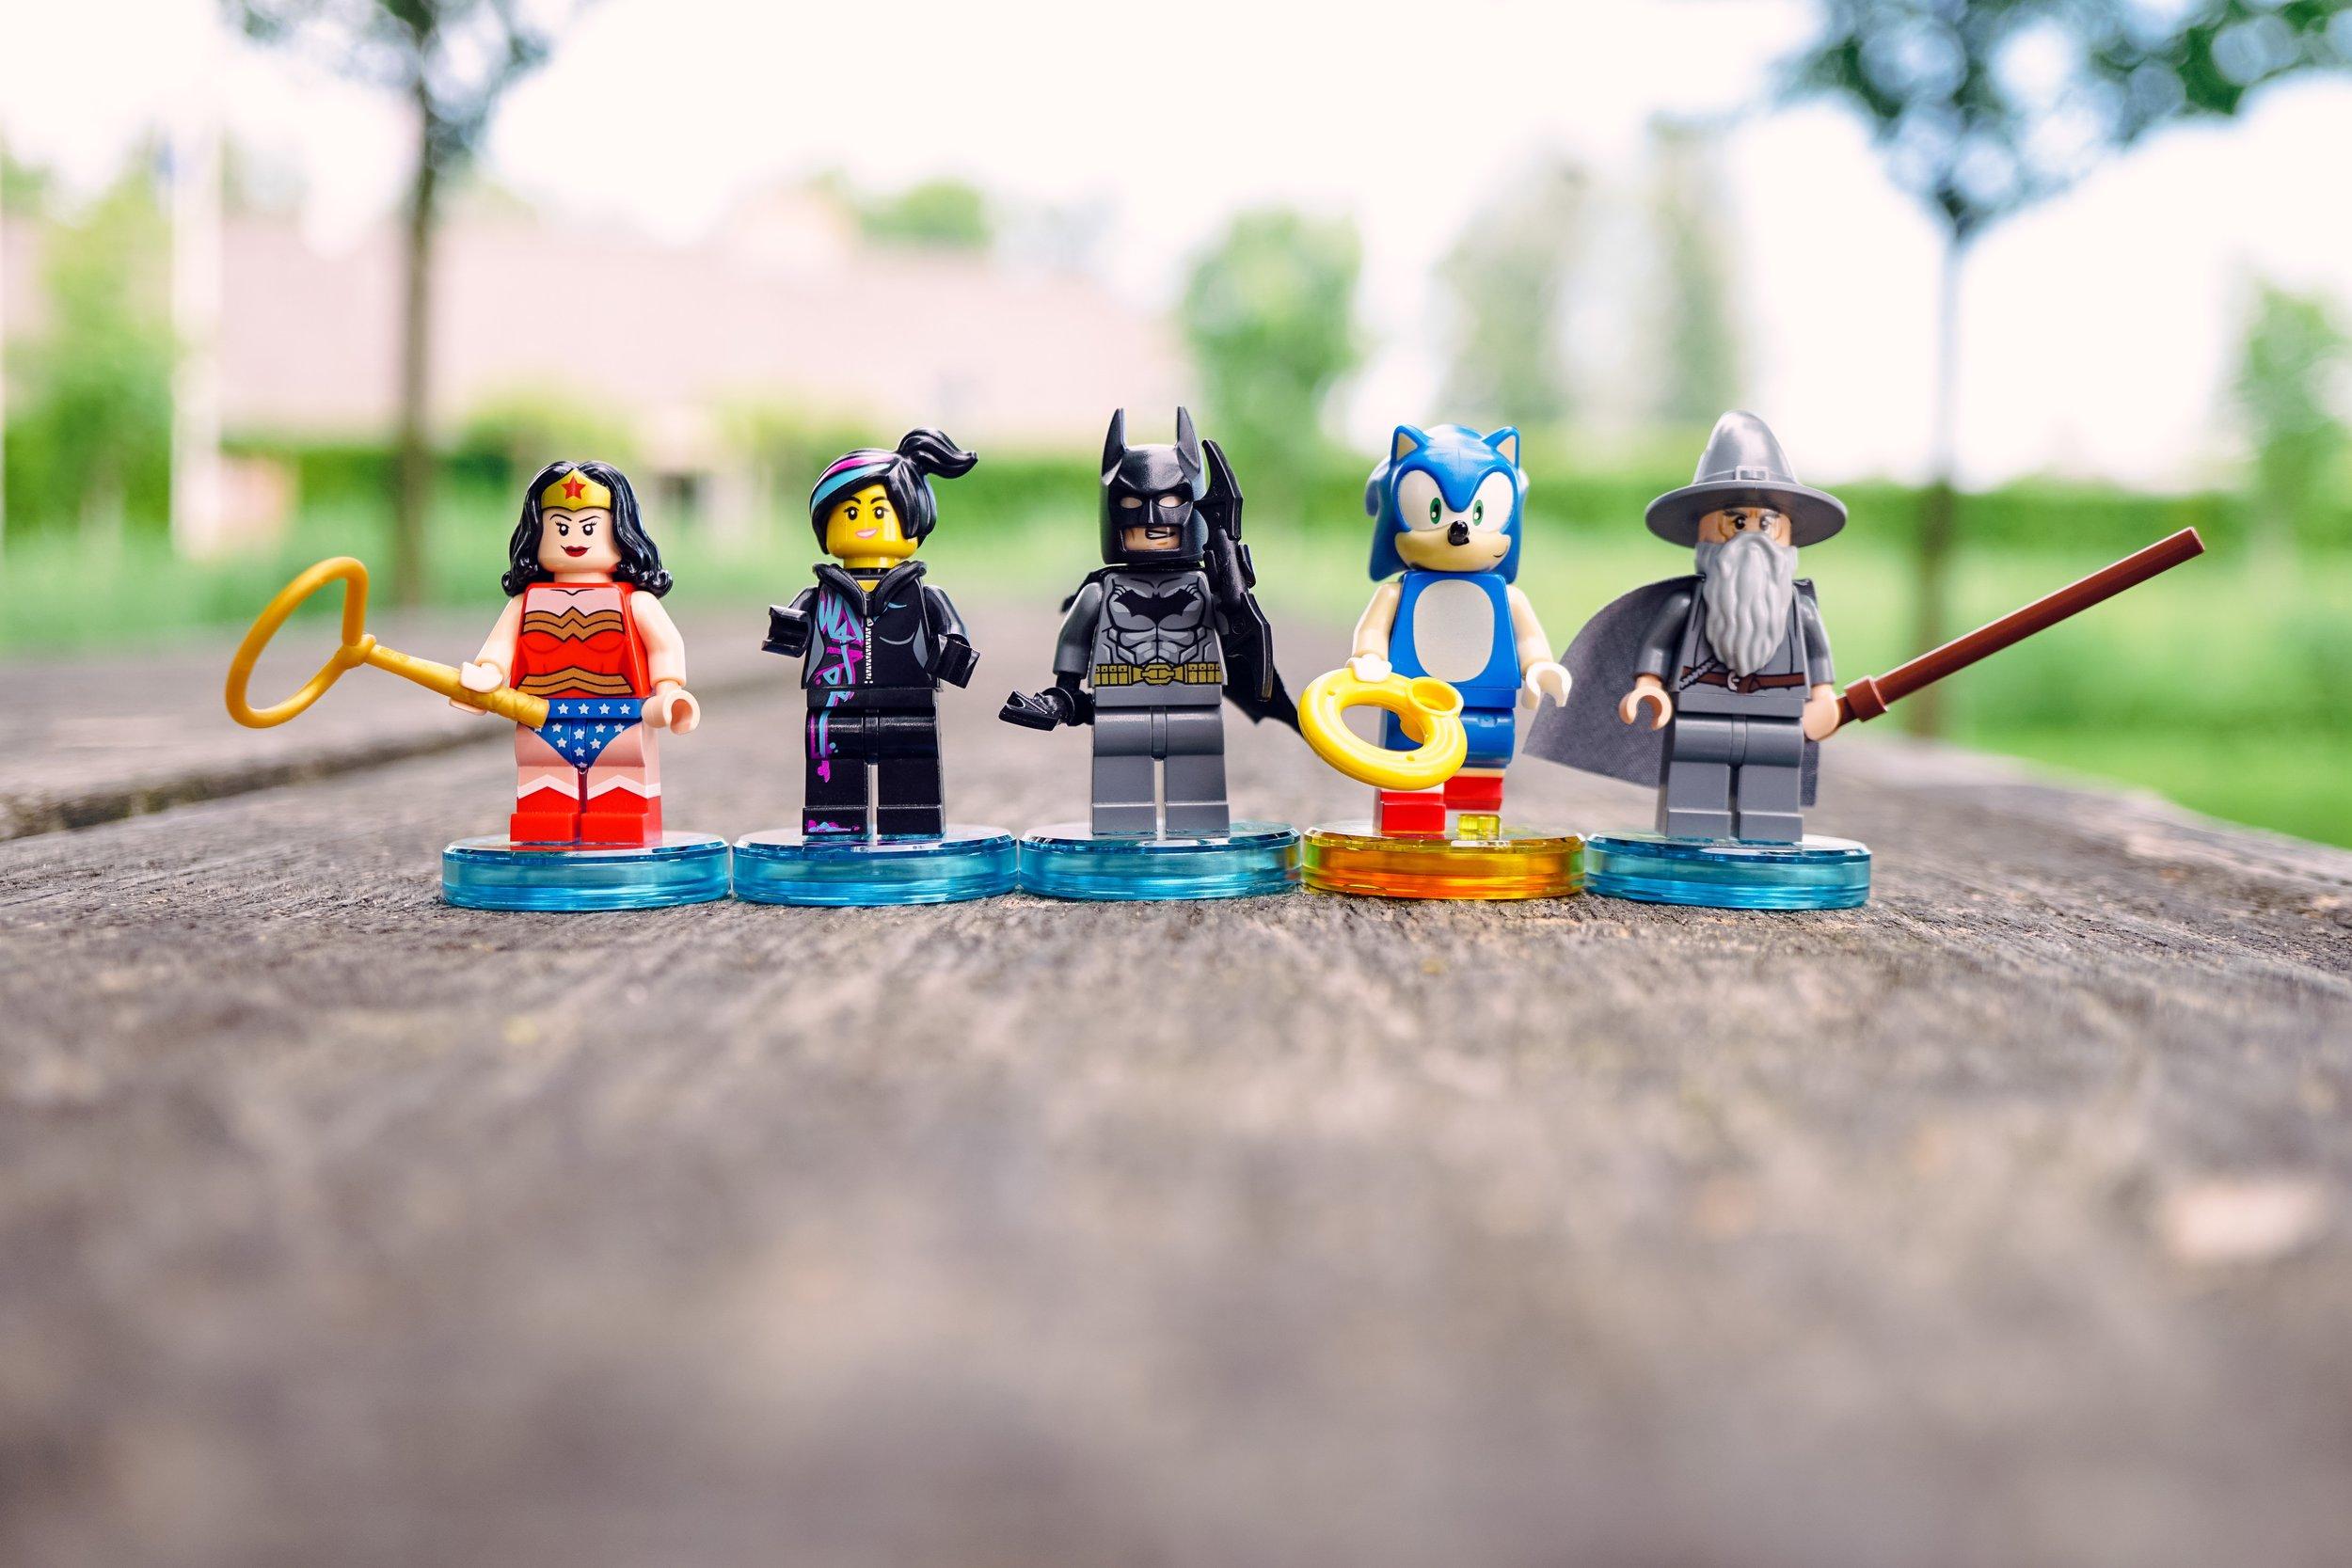 Lego Club - Bricks 4 KidzThursdays from 3:30 – 4:30 pm in the Great Room.Cost: $100-$150 (depends on enrollment)Register online: www.bricks4kidz.com/reno